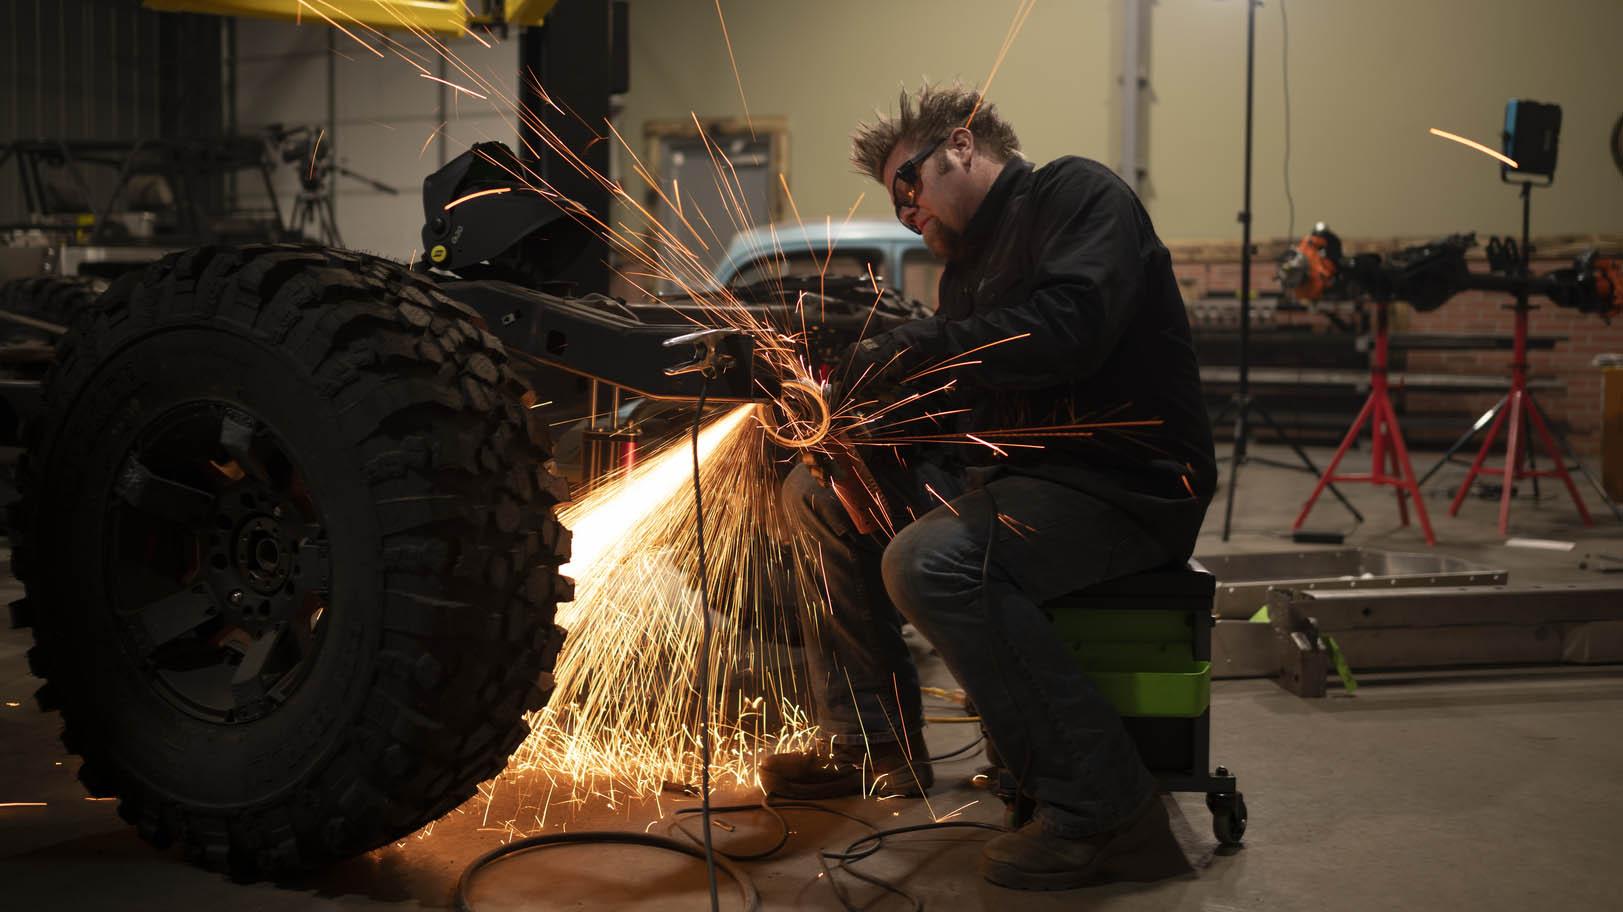 Truck Hero — Off-Road Rig Build